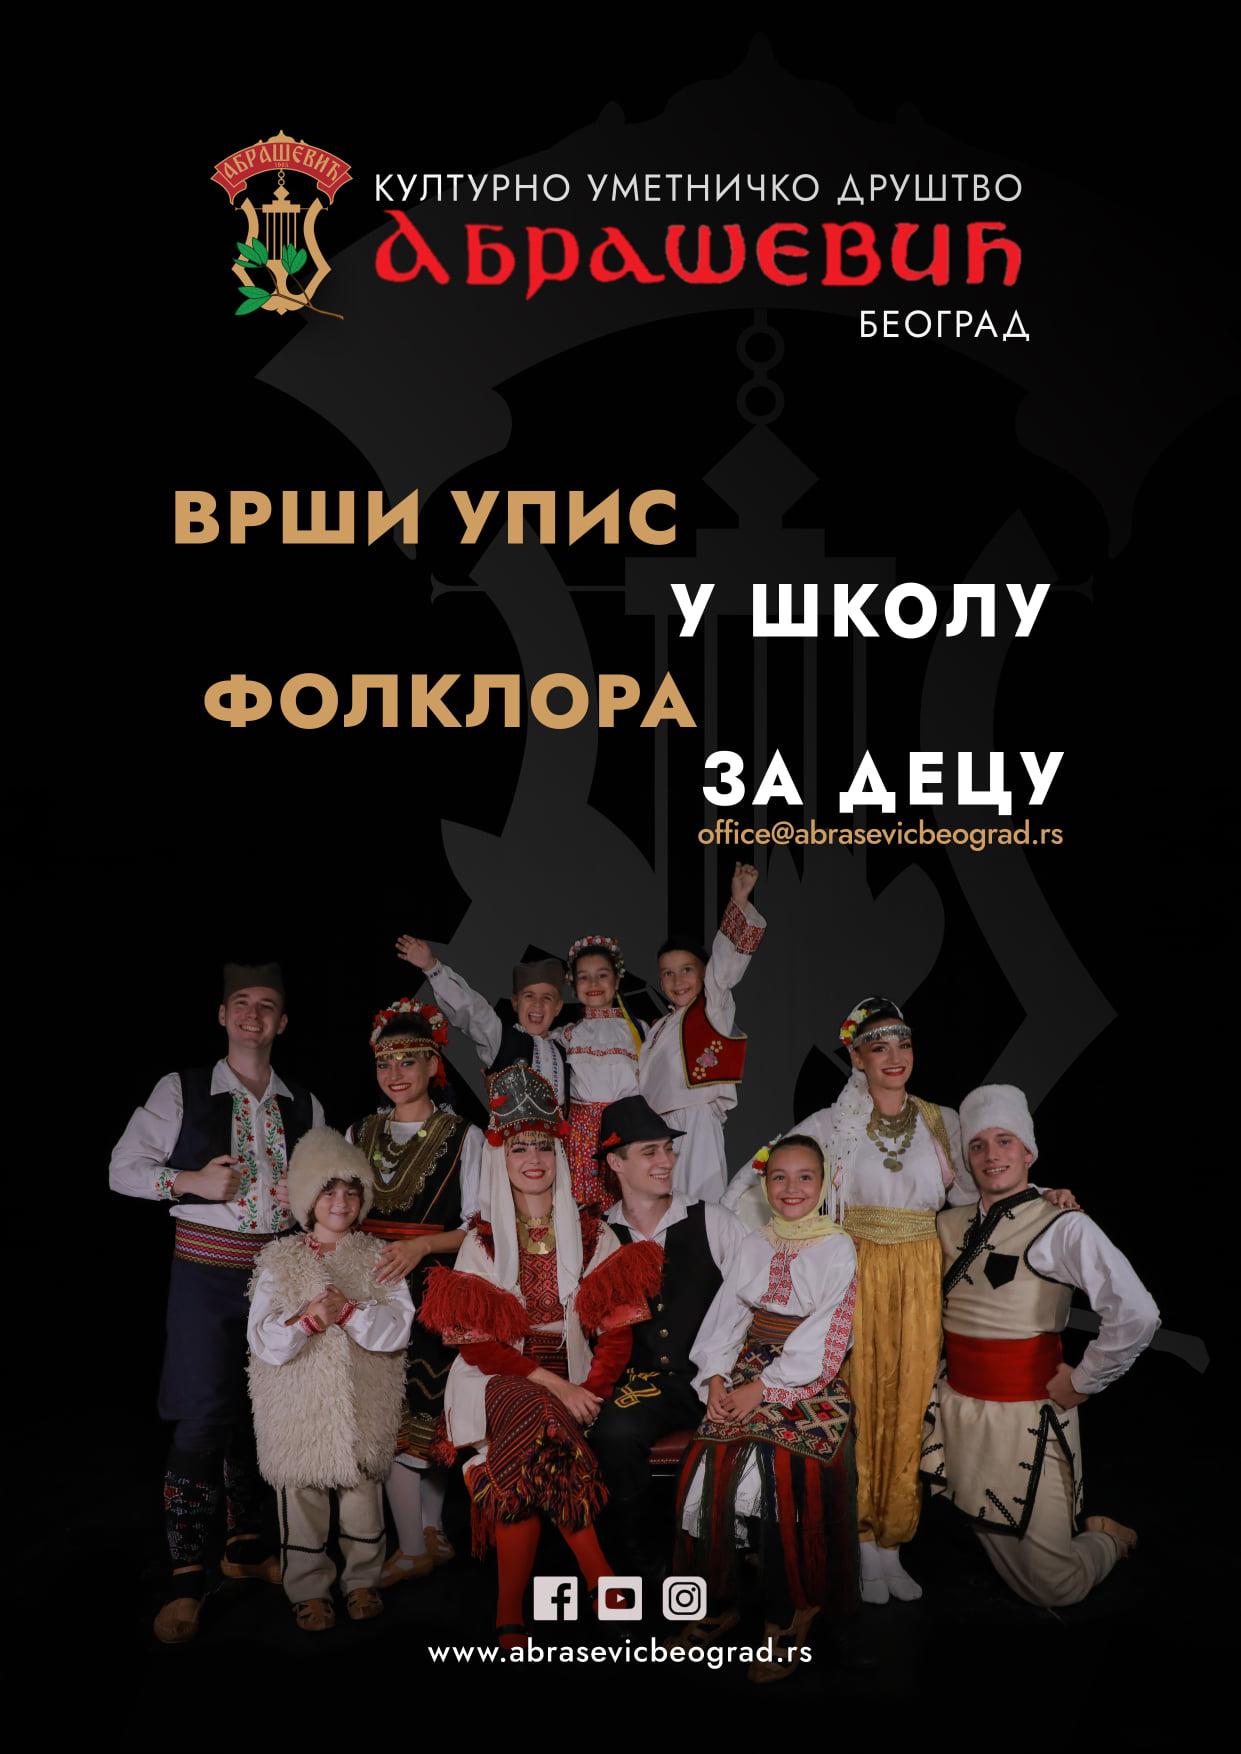 KUD Abrasevic Beograd vrsi upis u skolu folklora